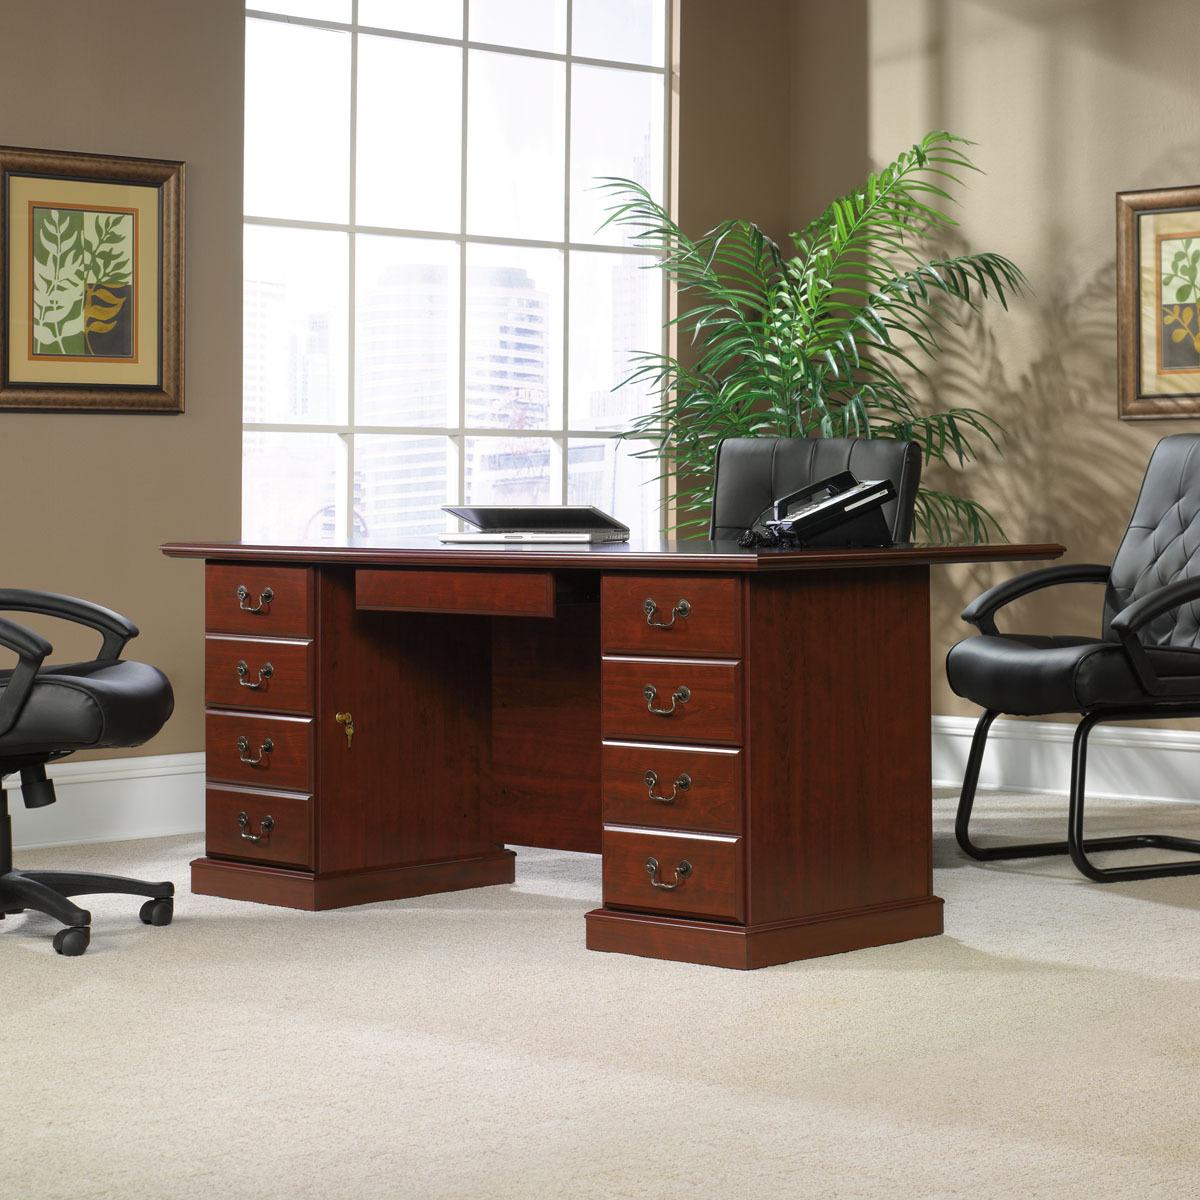 Sauder Heritage Hill Executive Desk 109843